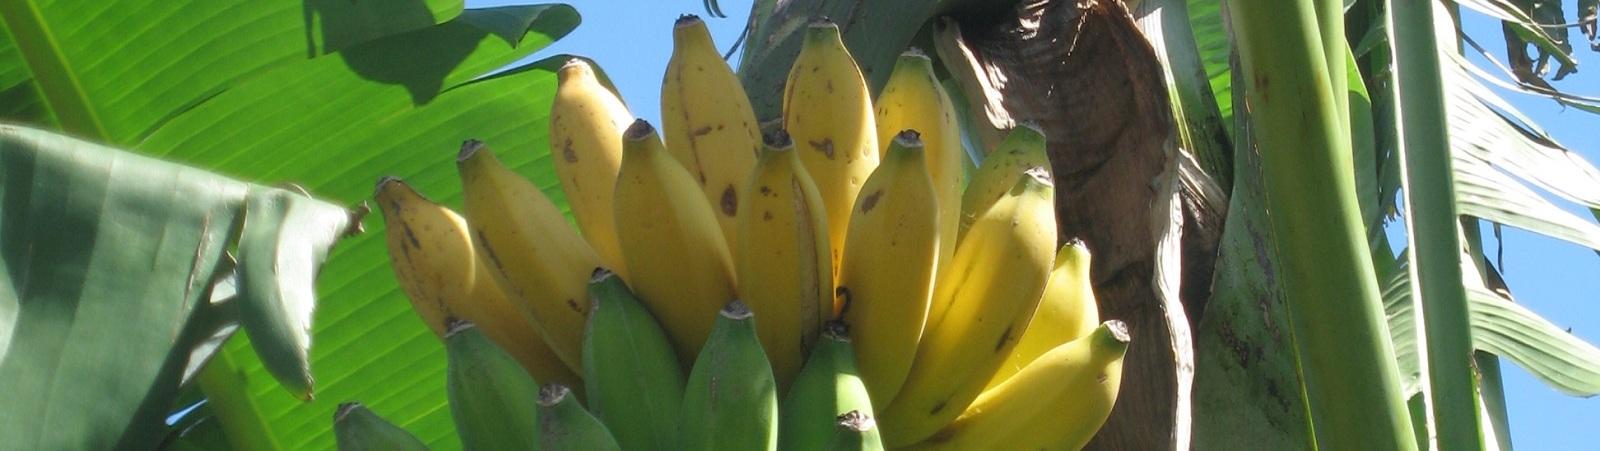 NO GMO BANANA CAMPAIGN –